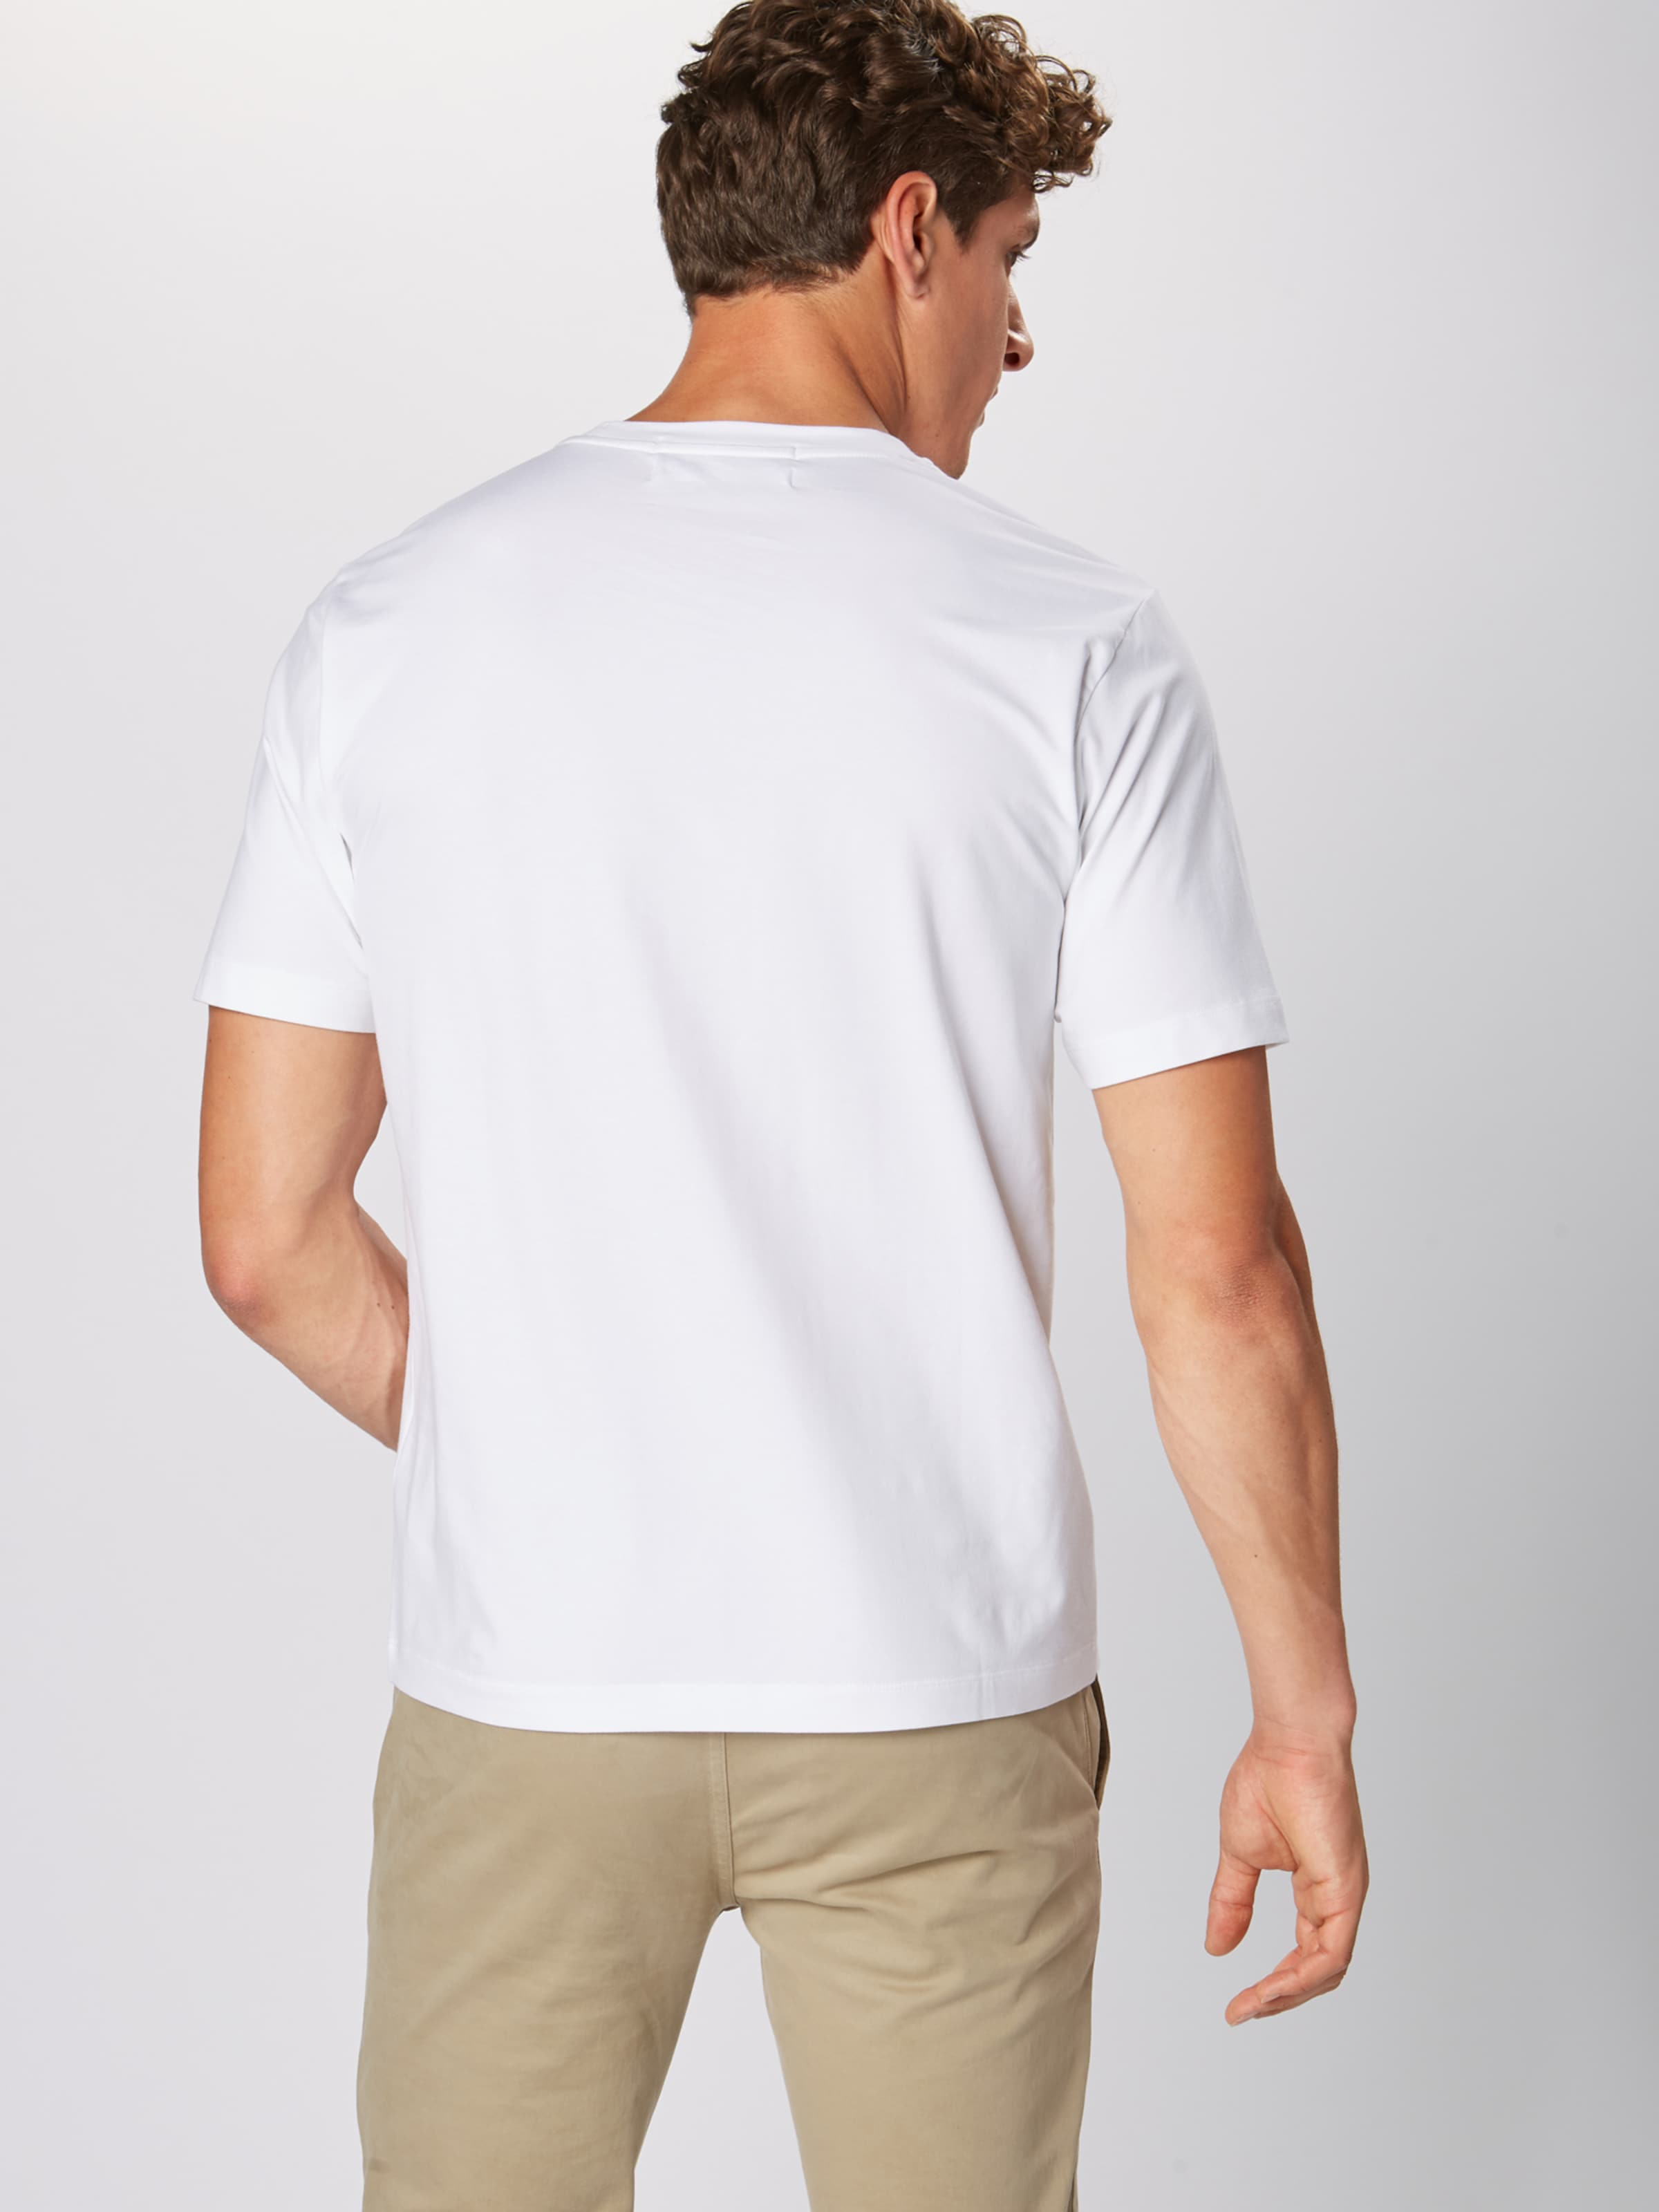 Calvin Jeans Weiß shirt T Klein In 0wOmvnN8